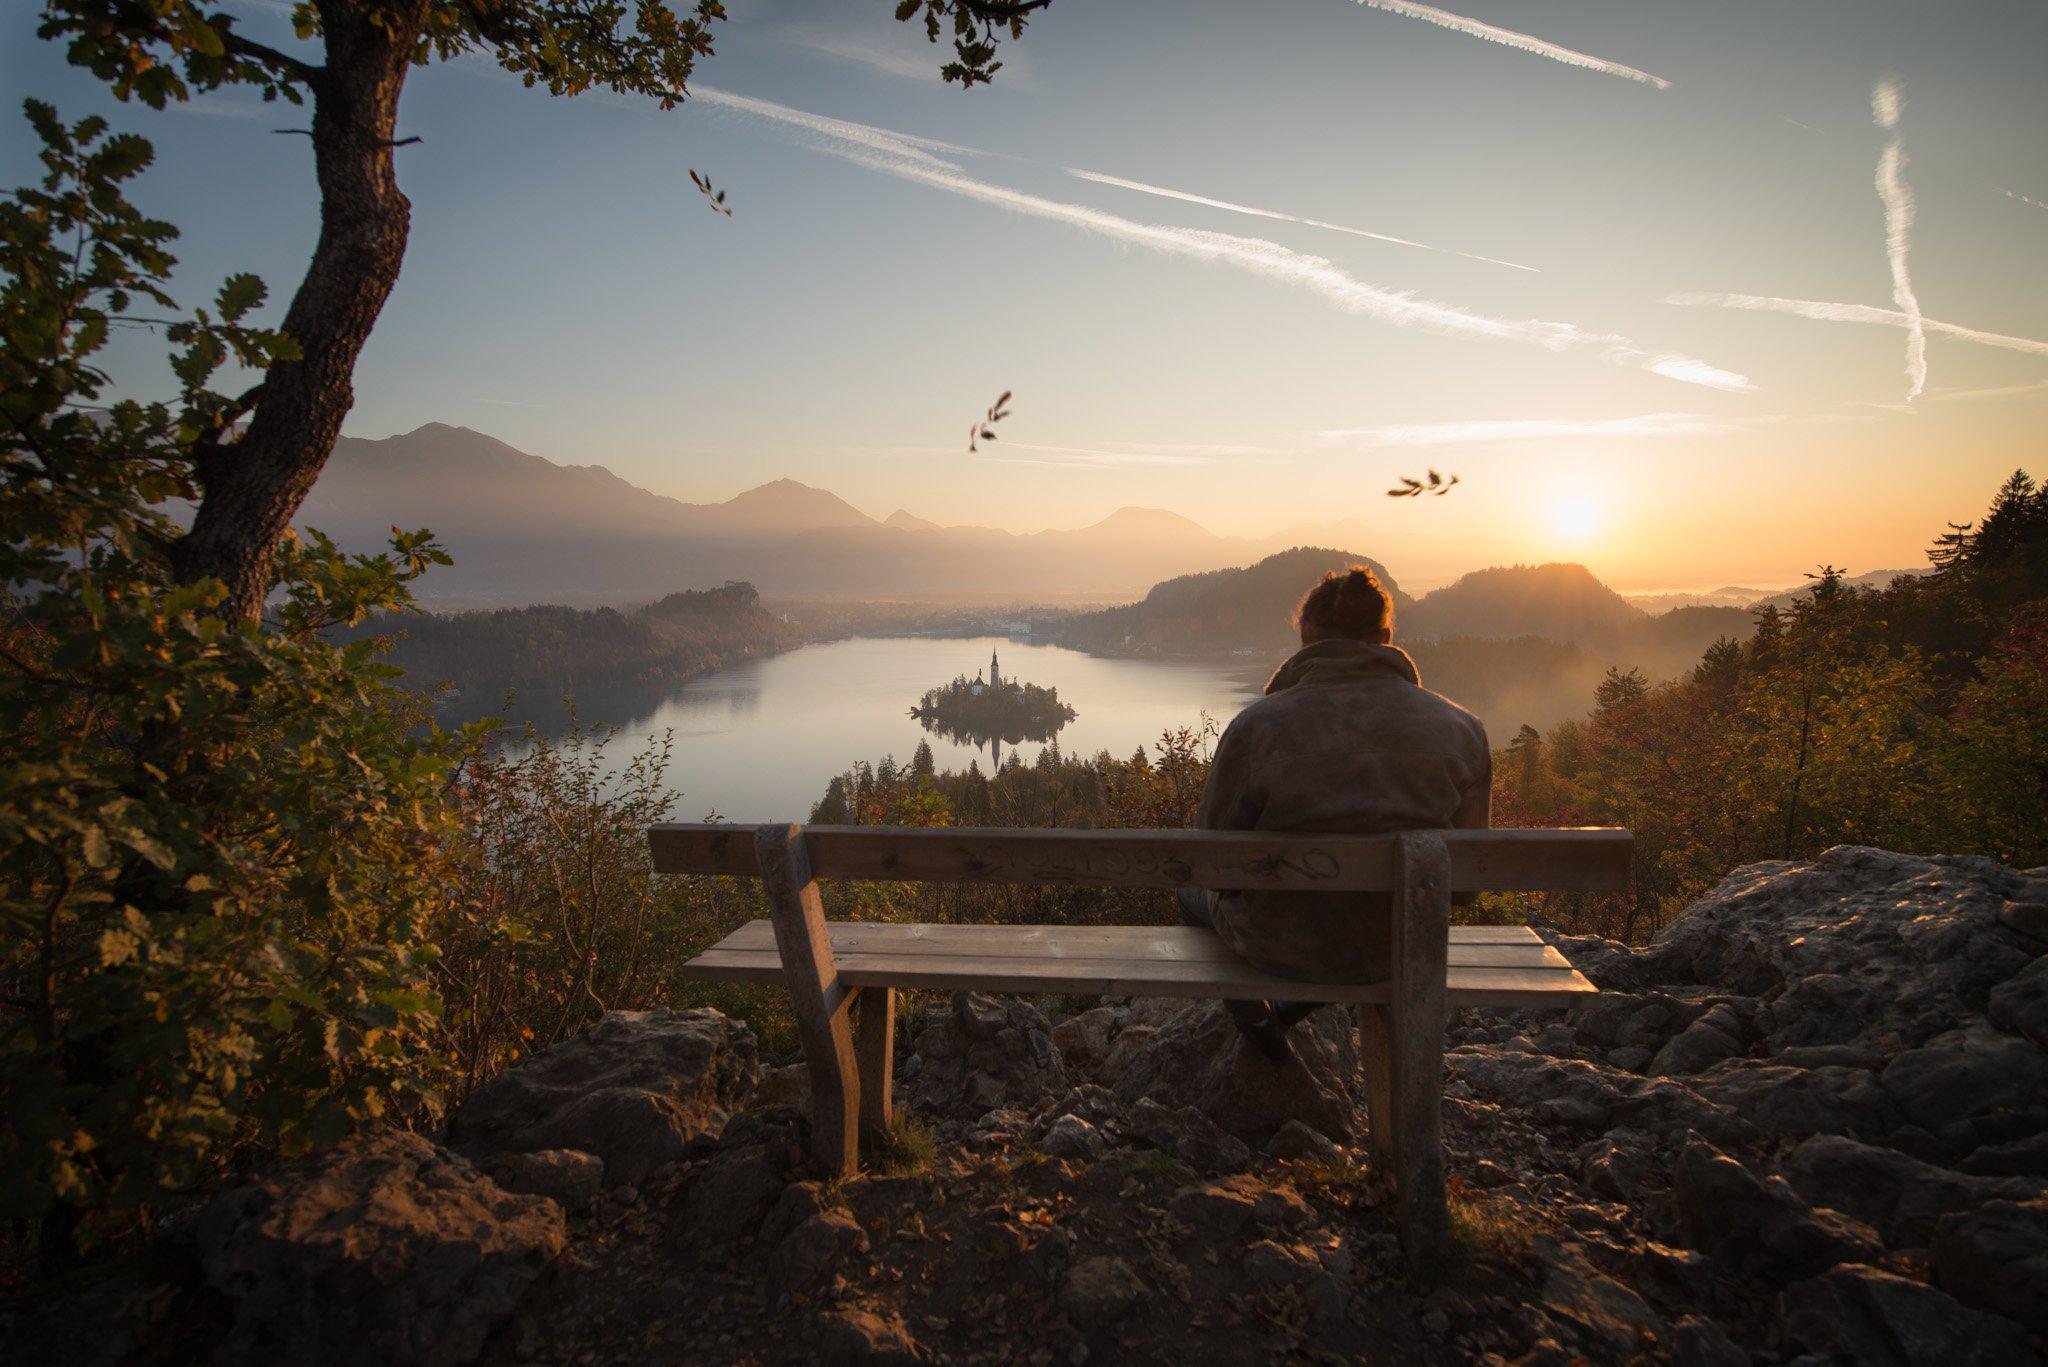 Bled, slovenia, sunrise, hope, sorrow, Jarkko Järvinen